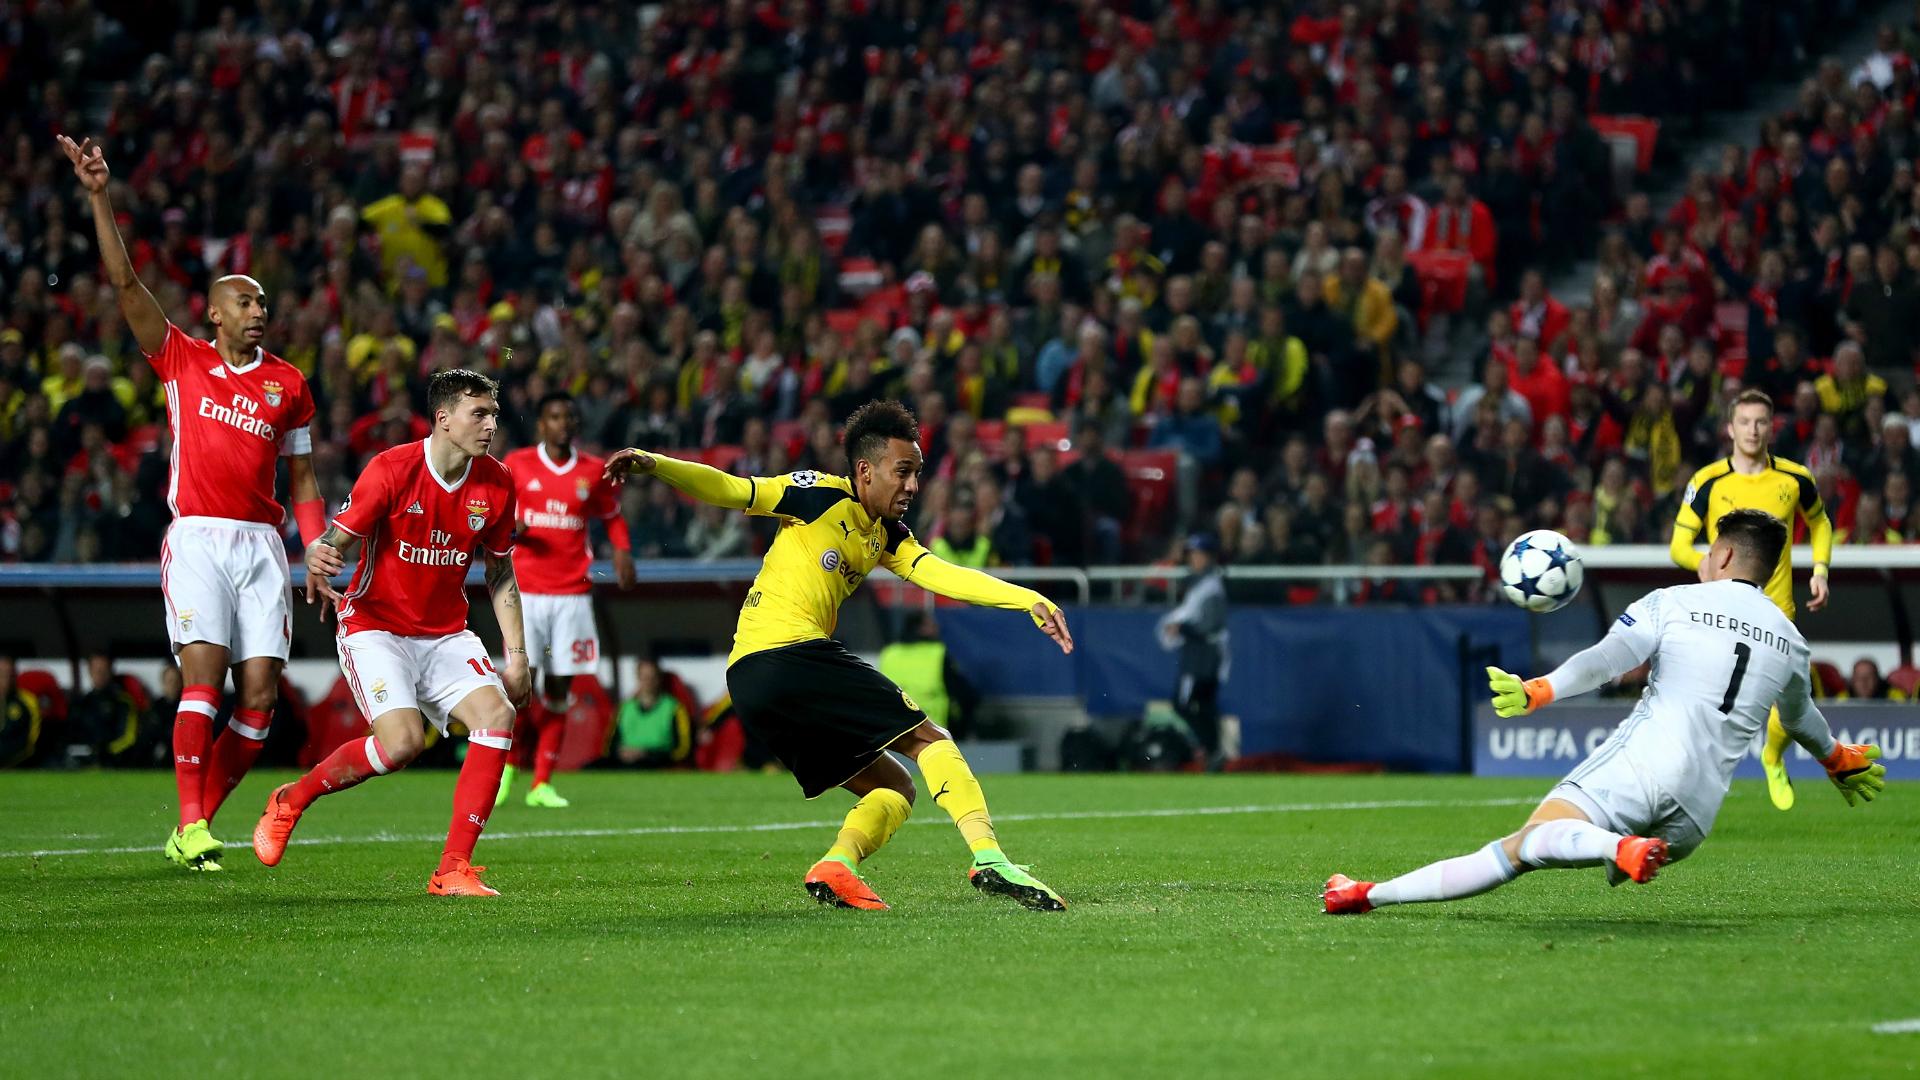 Ederson e Aubameyang - Benfica x Borussia Dortmund Champions League 14022017